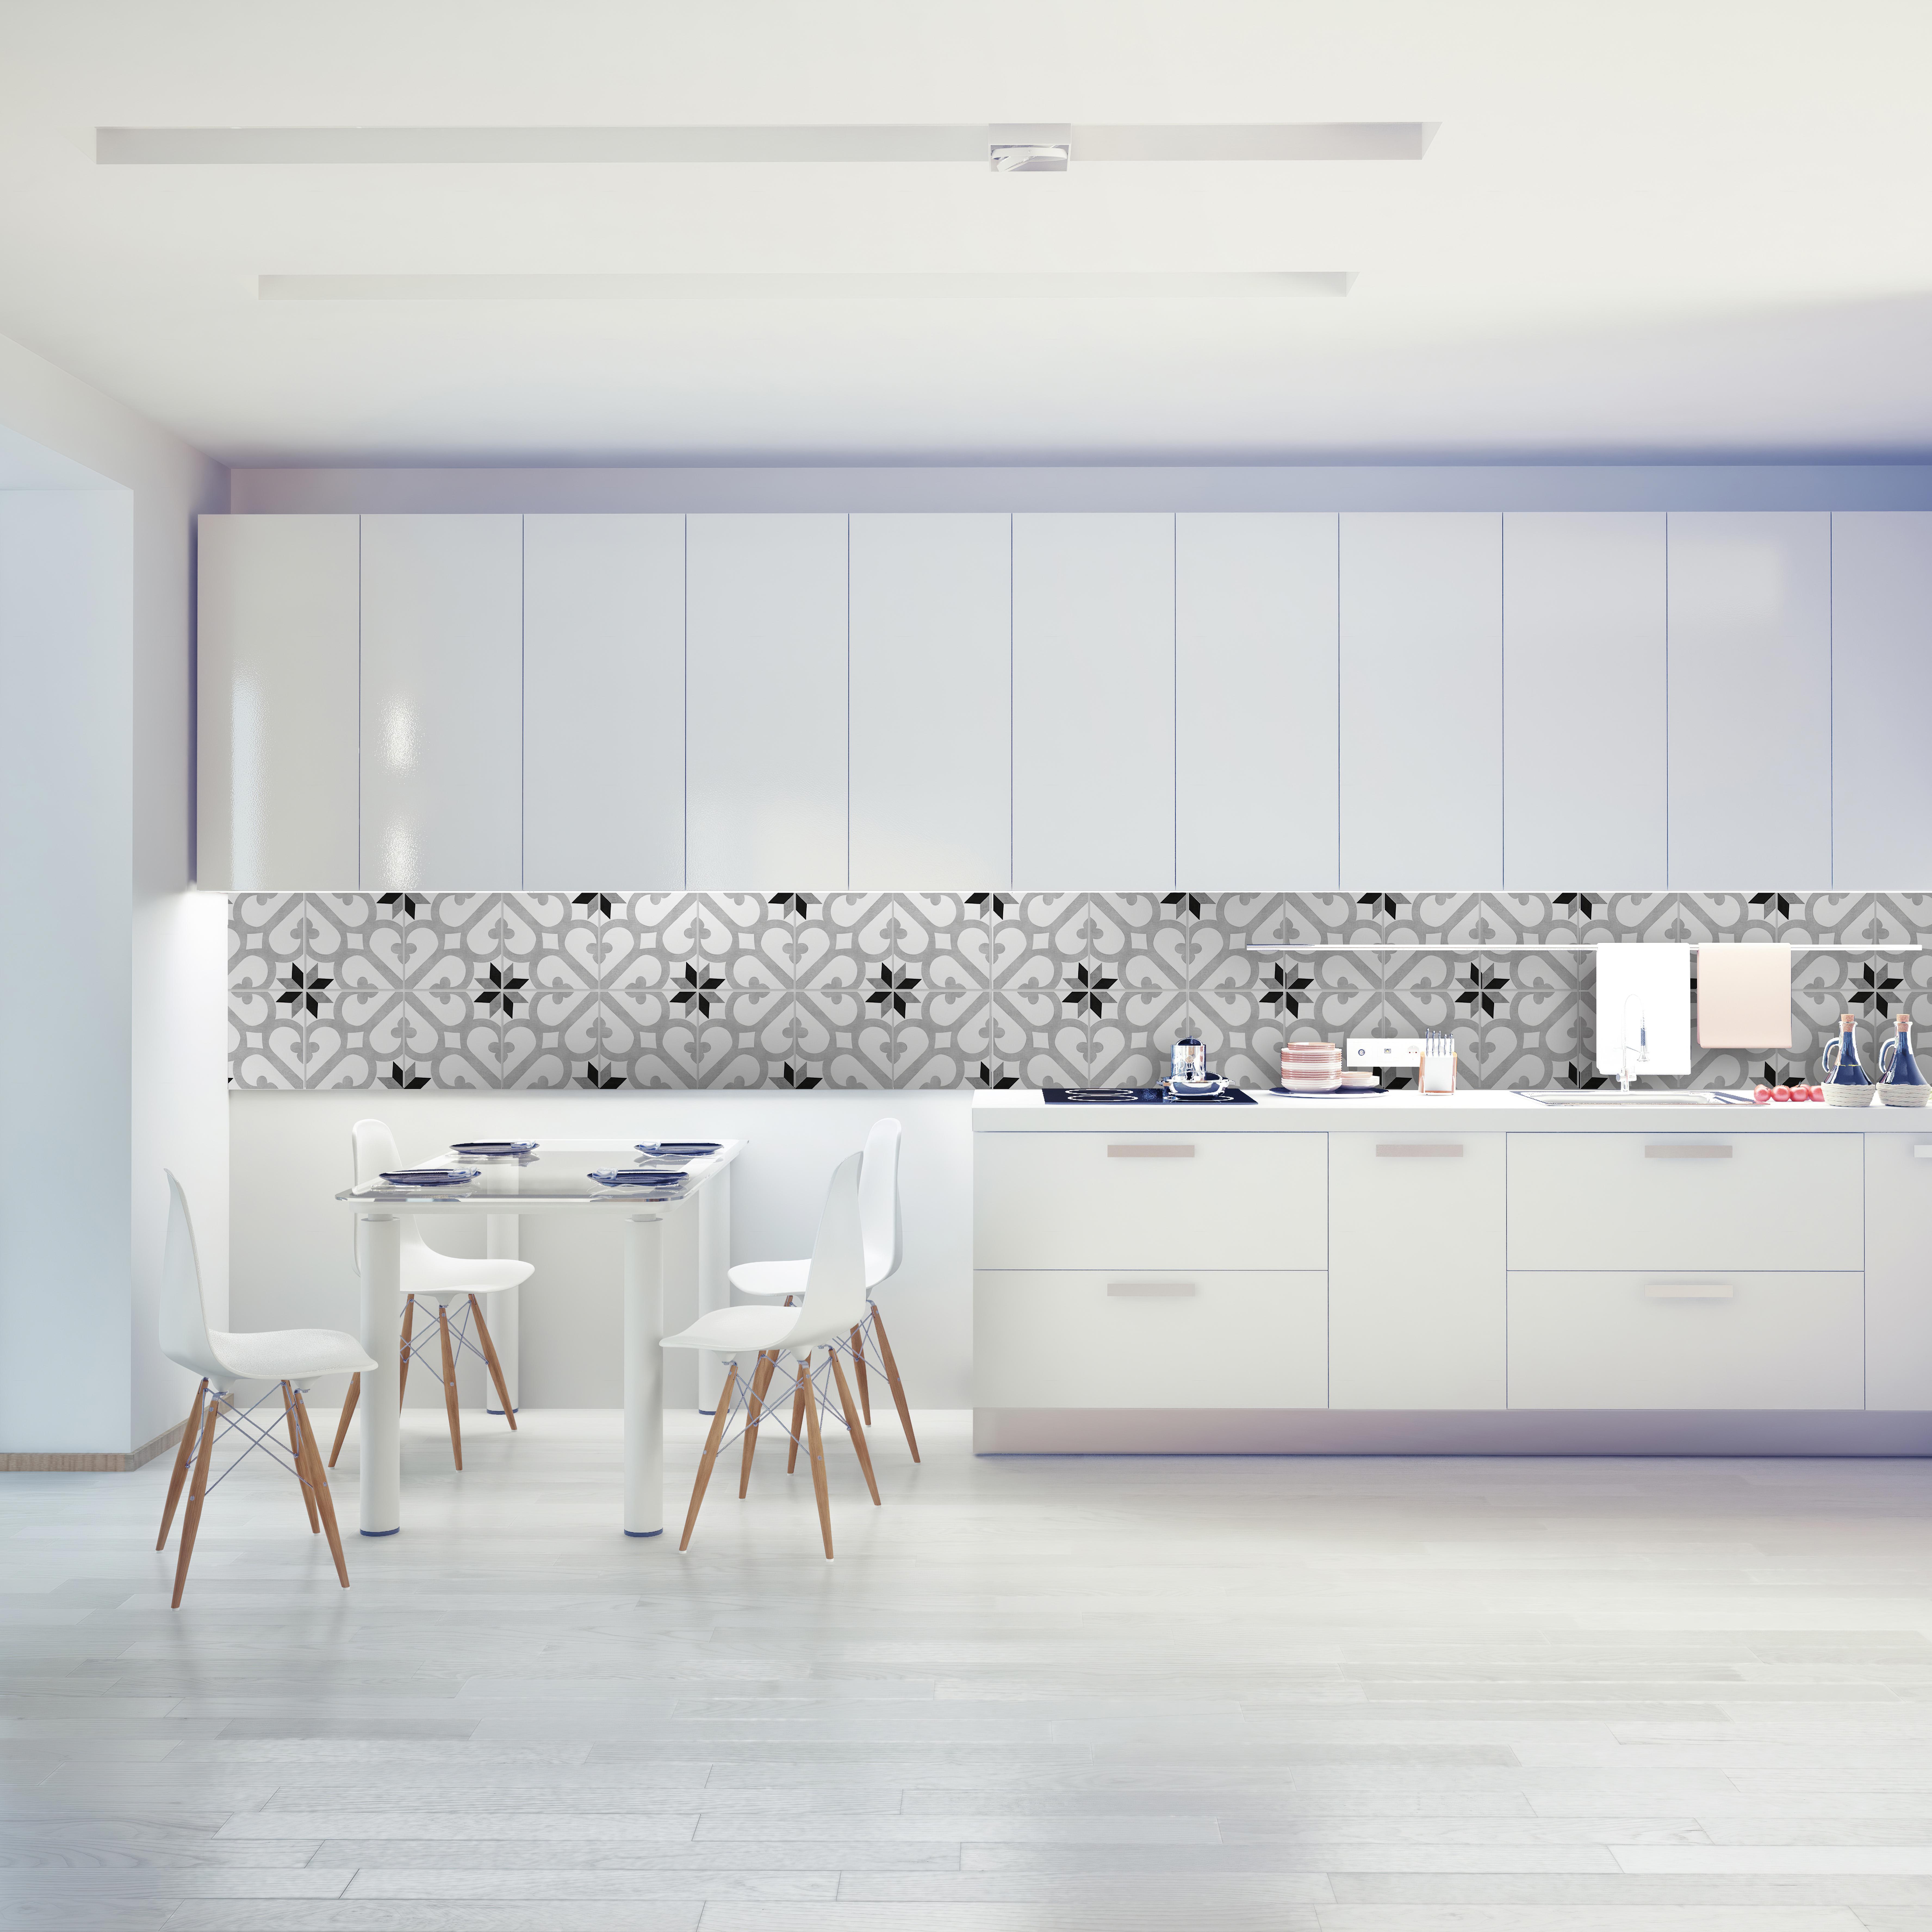 - Kitchen Backsplash Decor - Diana Tile Stickers - Moonwallstickers.com